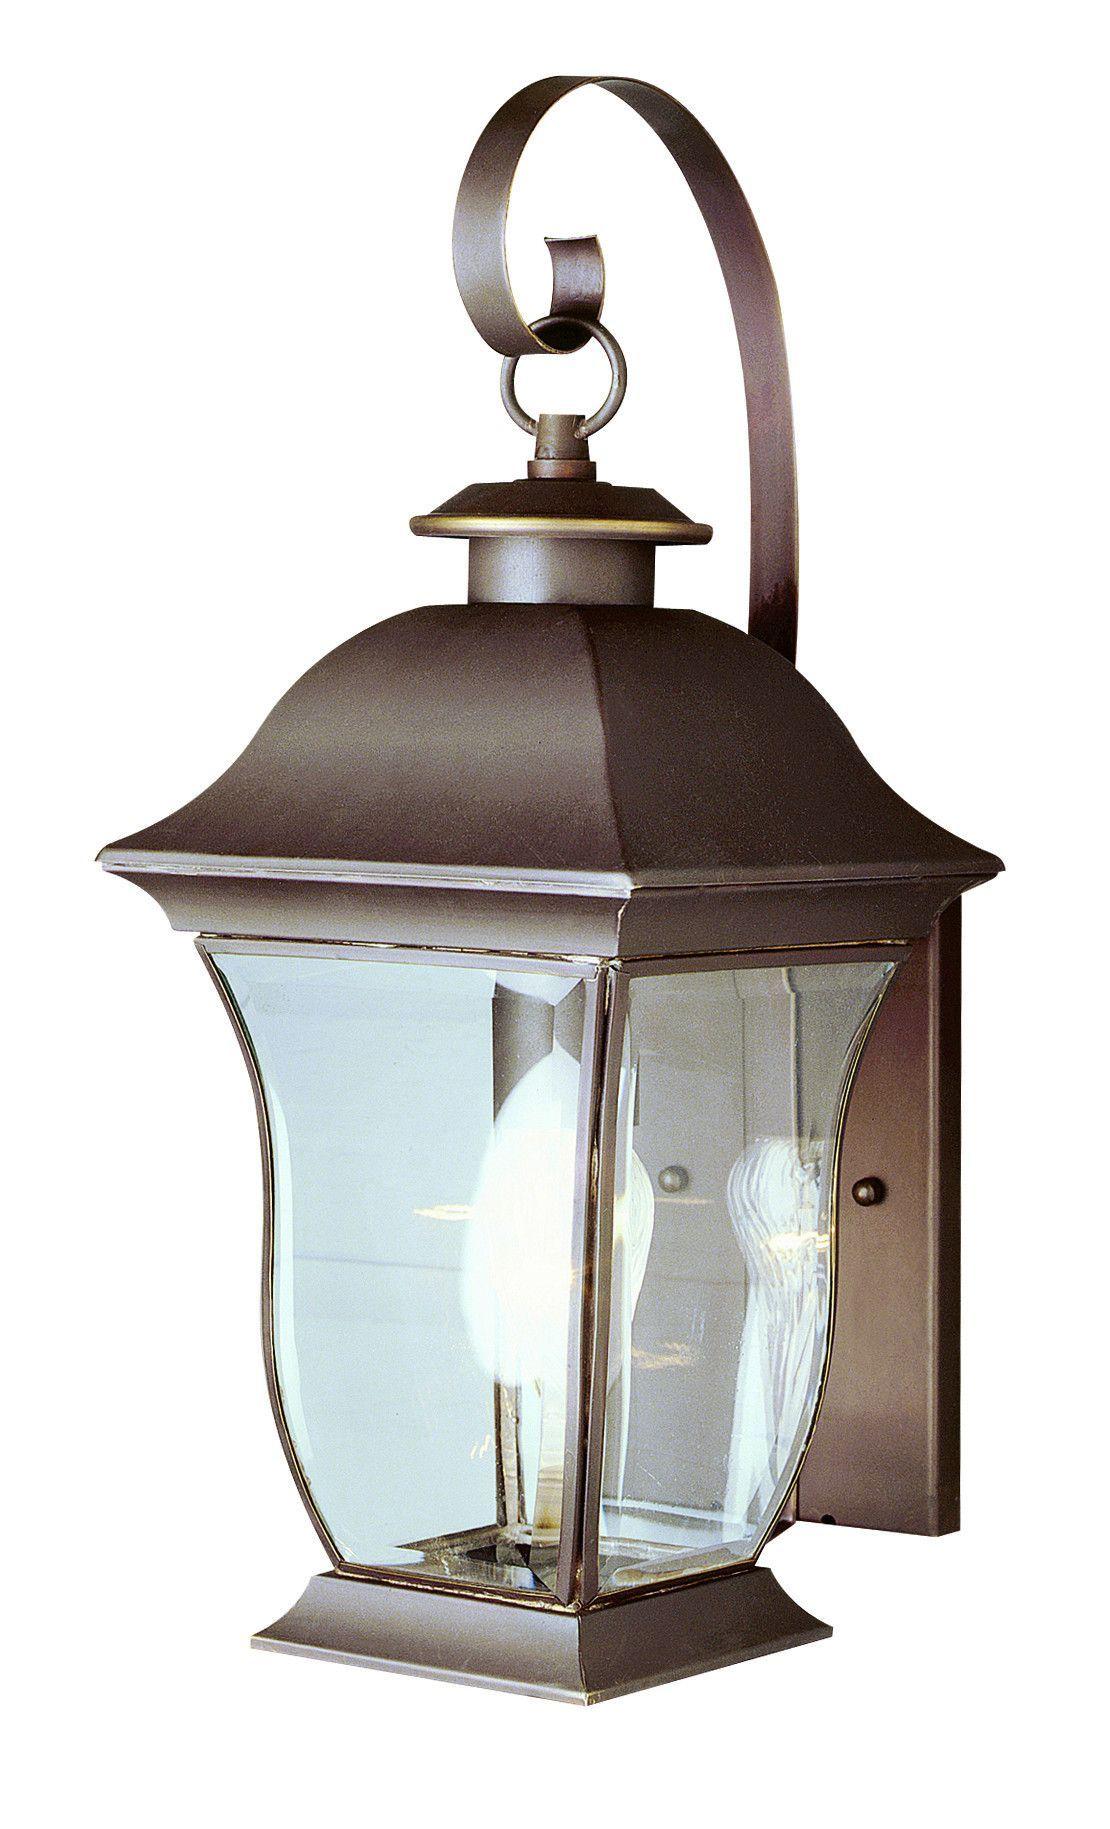 Trans globe lighting 4970 wb 18 high outdoor wall coach light trans globe lighting 4970 wb 18 high outdoor wall coach light arubaitofo Choice Image